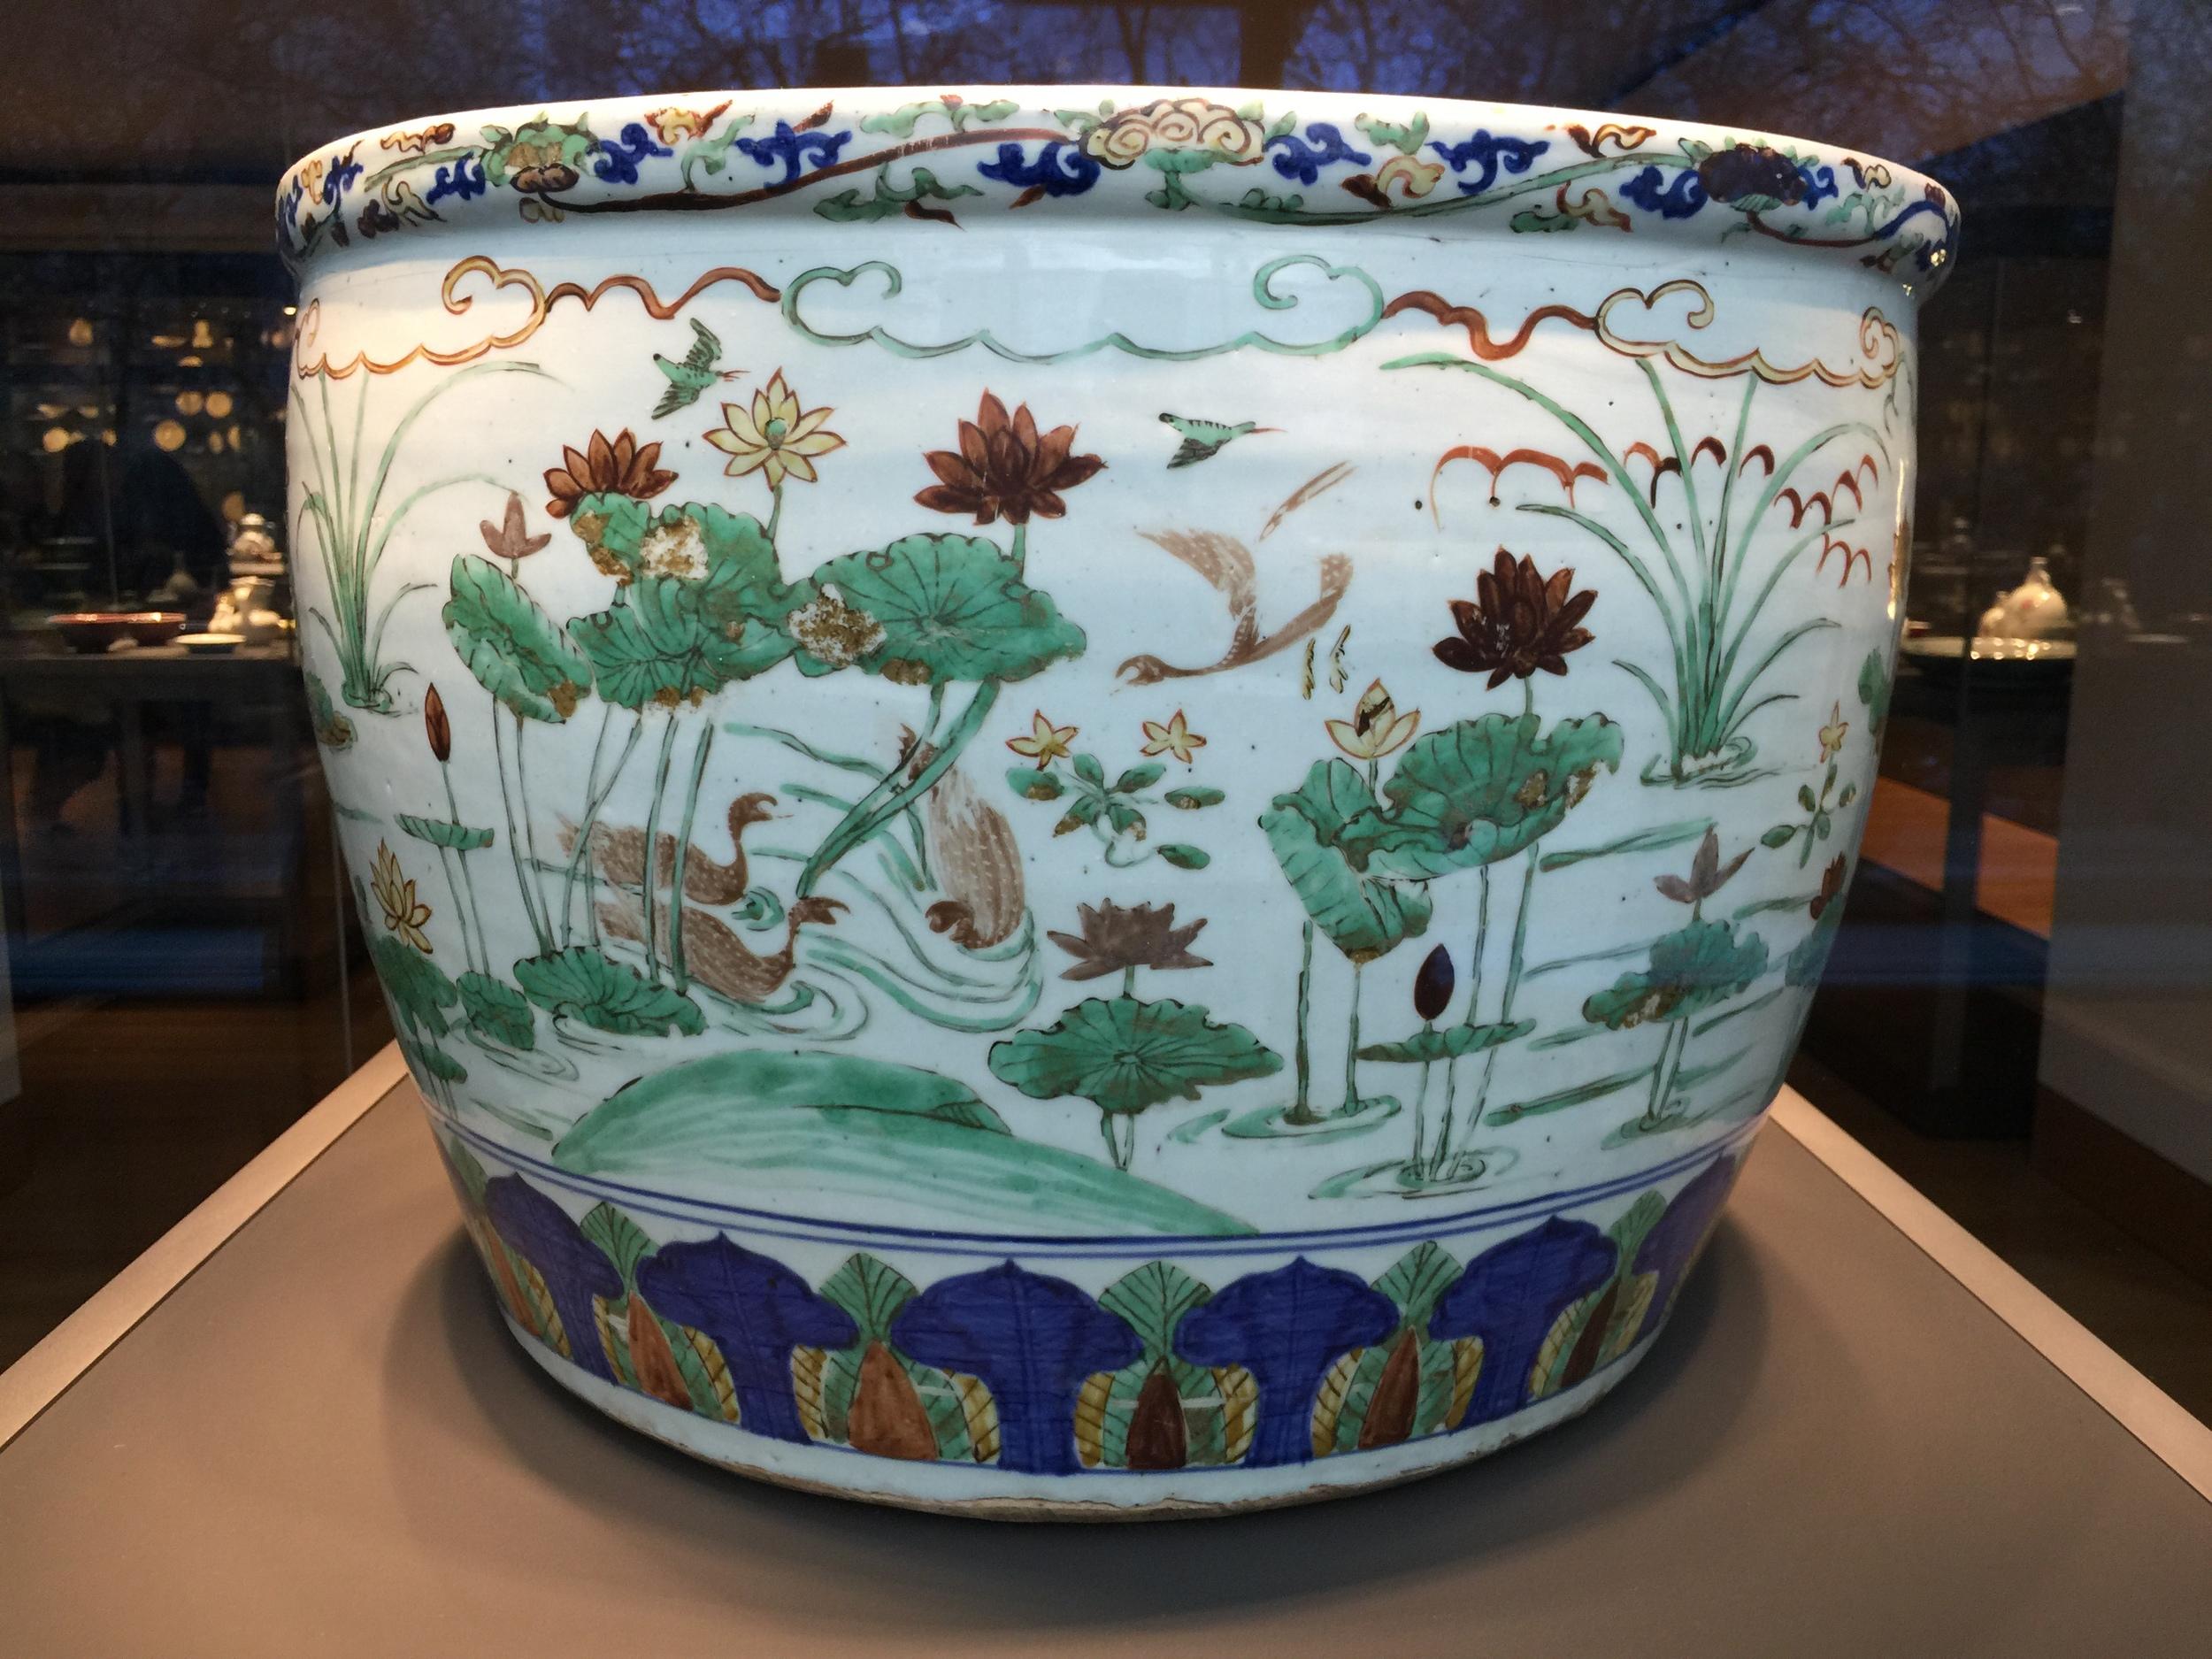 Chinese-Porcelain-British-Museum-Percival-David-jessewaugh.com-23.jpg